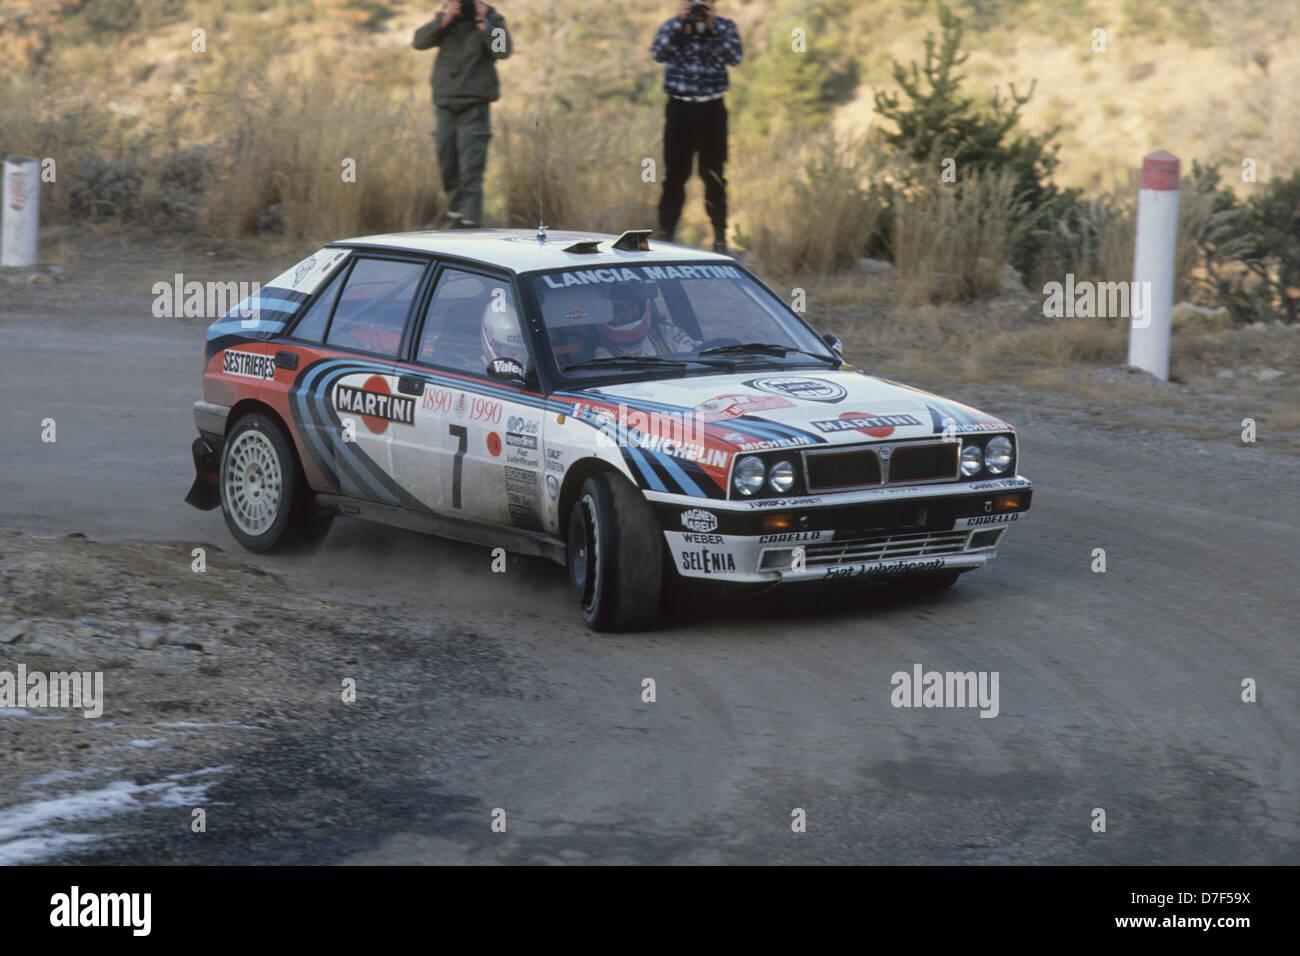 https://c8.alamy.com/comp/D7F59X/lancia-delta-integrale-on-the-monte-carlo-rally-1990-auriol-didier-D7F59X.jpg